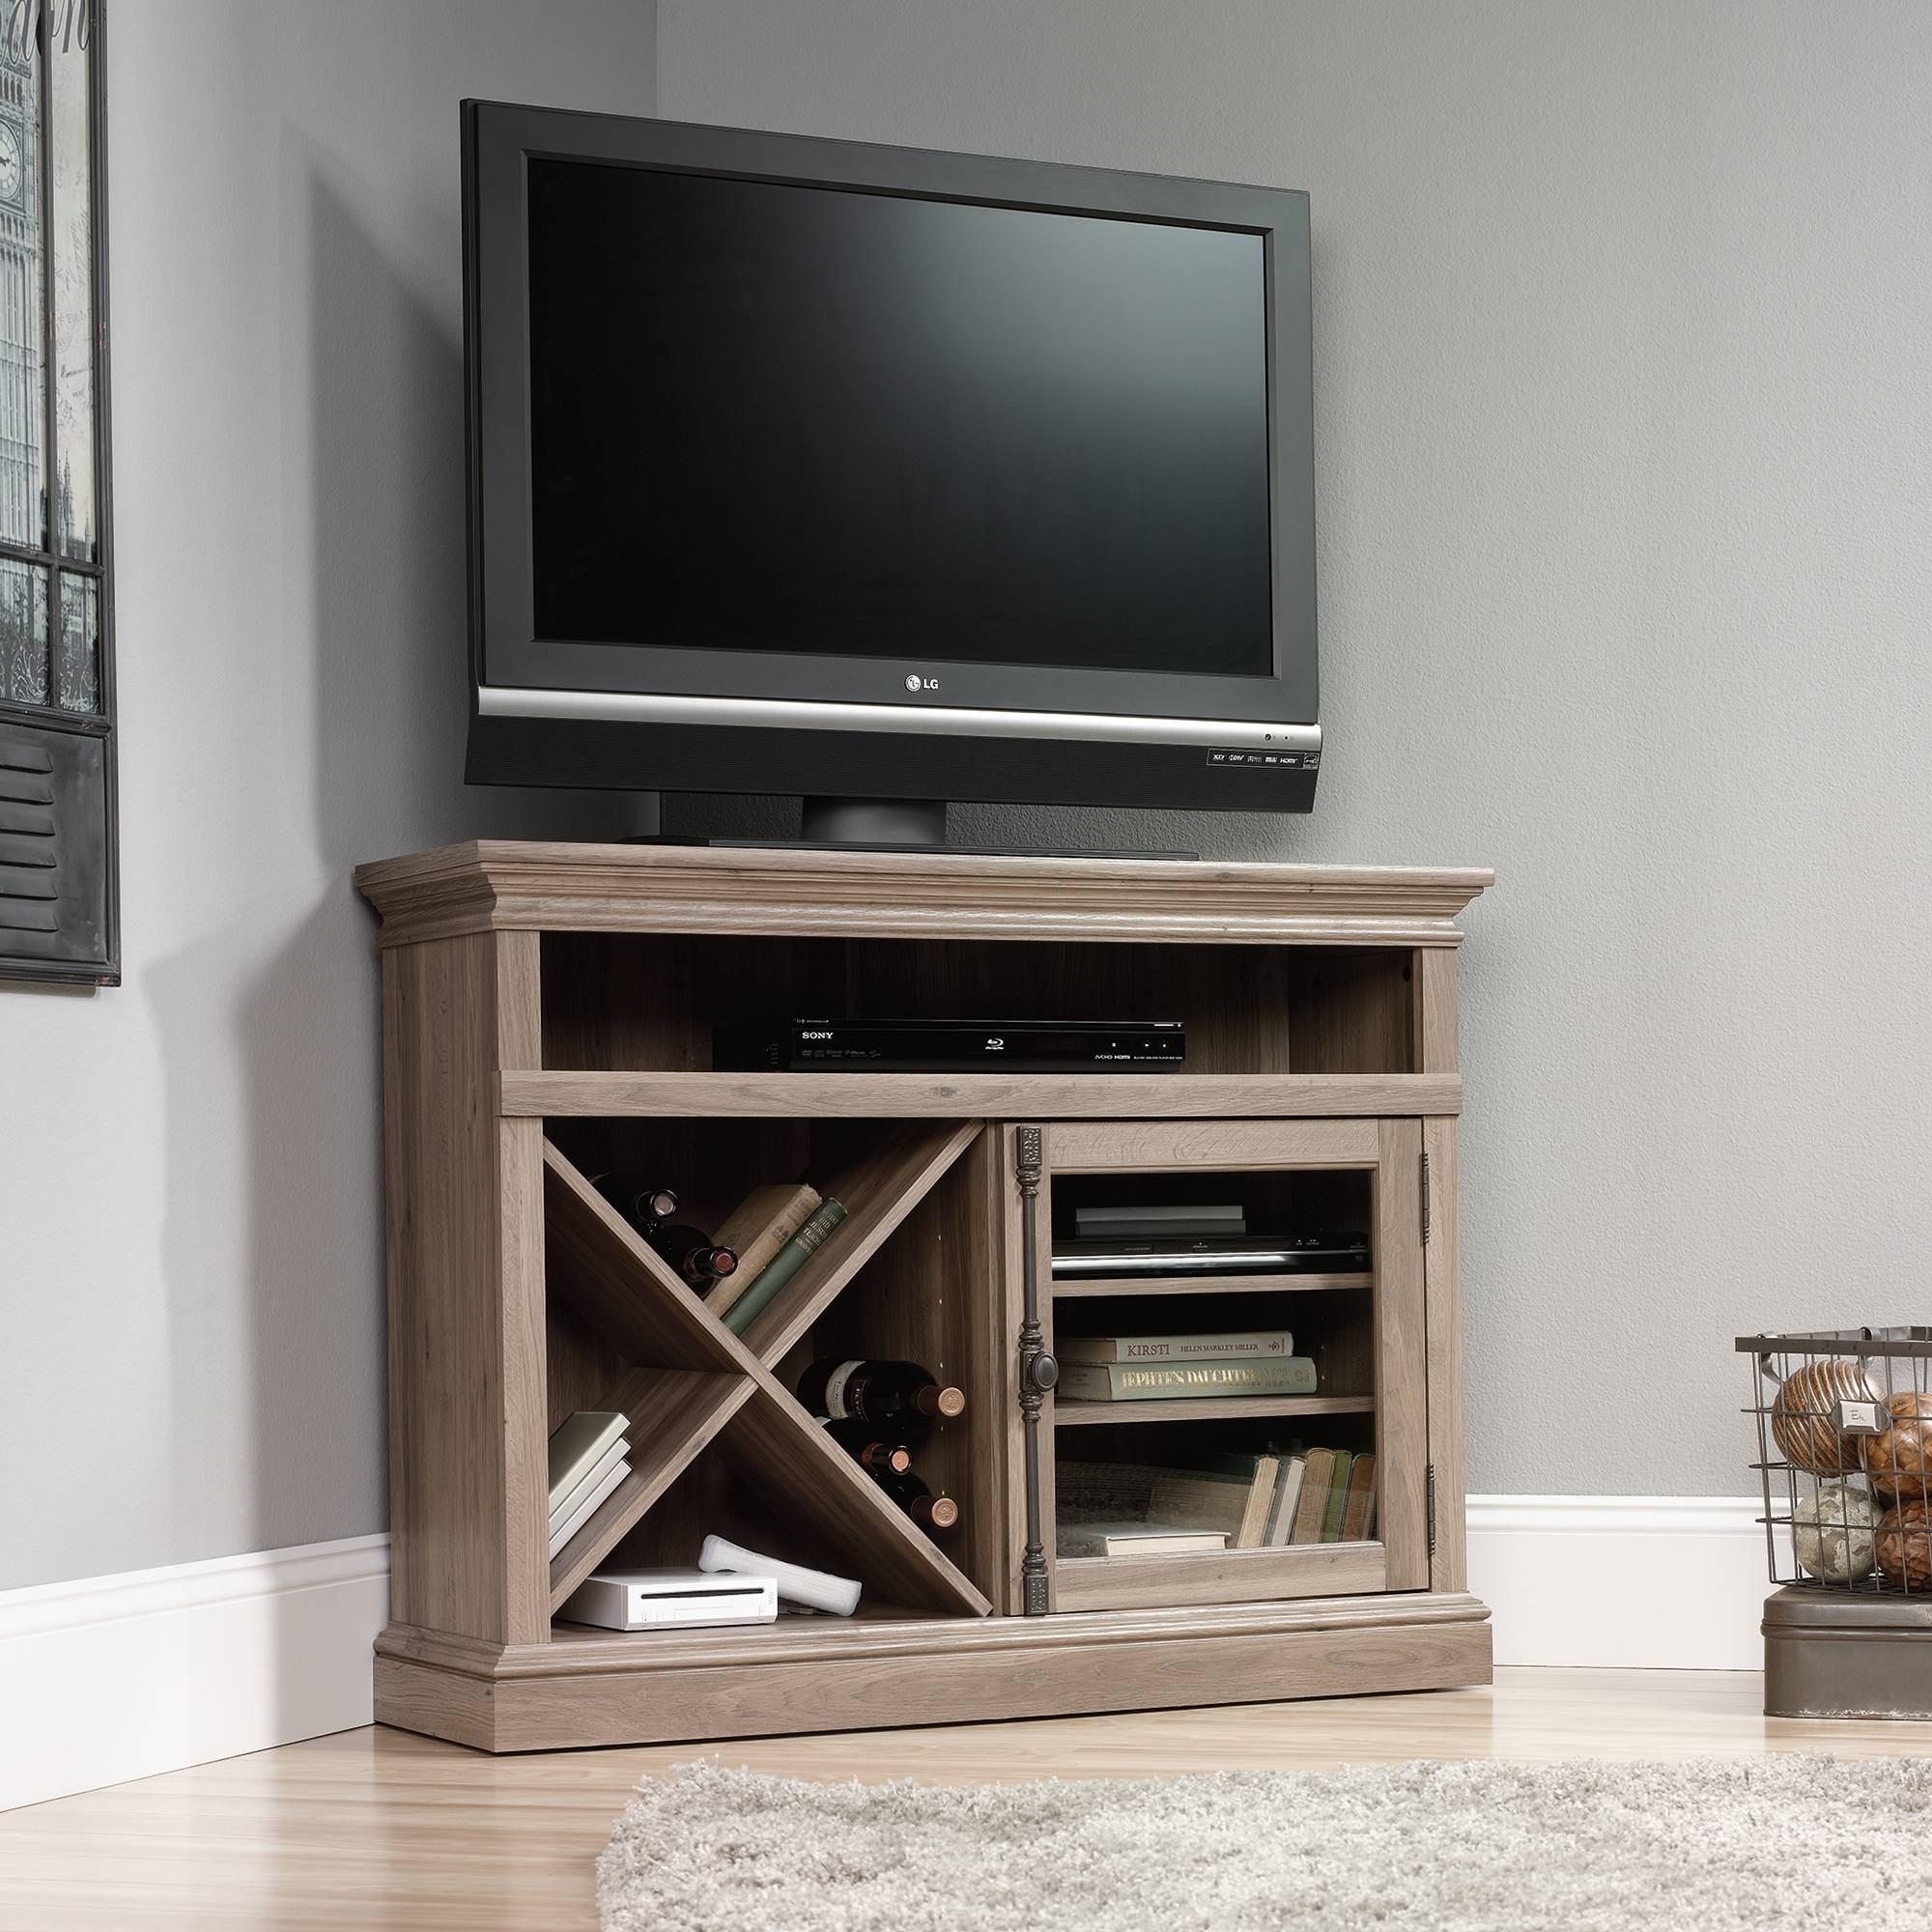 Barrister Lane | Corner Tv Stand | 414729 | Sauder within Grey Corner Tv Stands (Image 2 of 15)